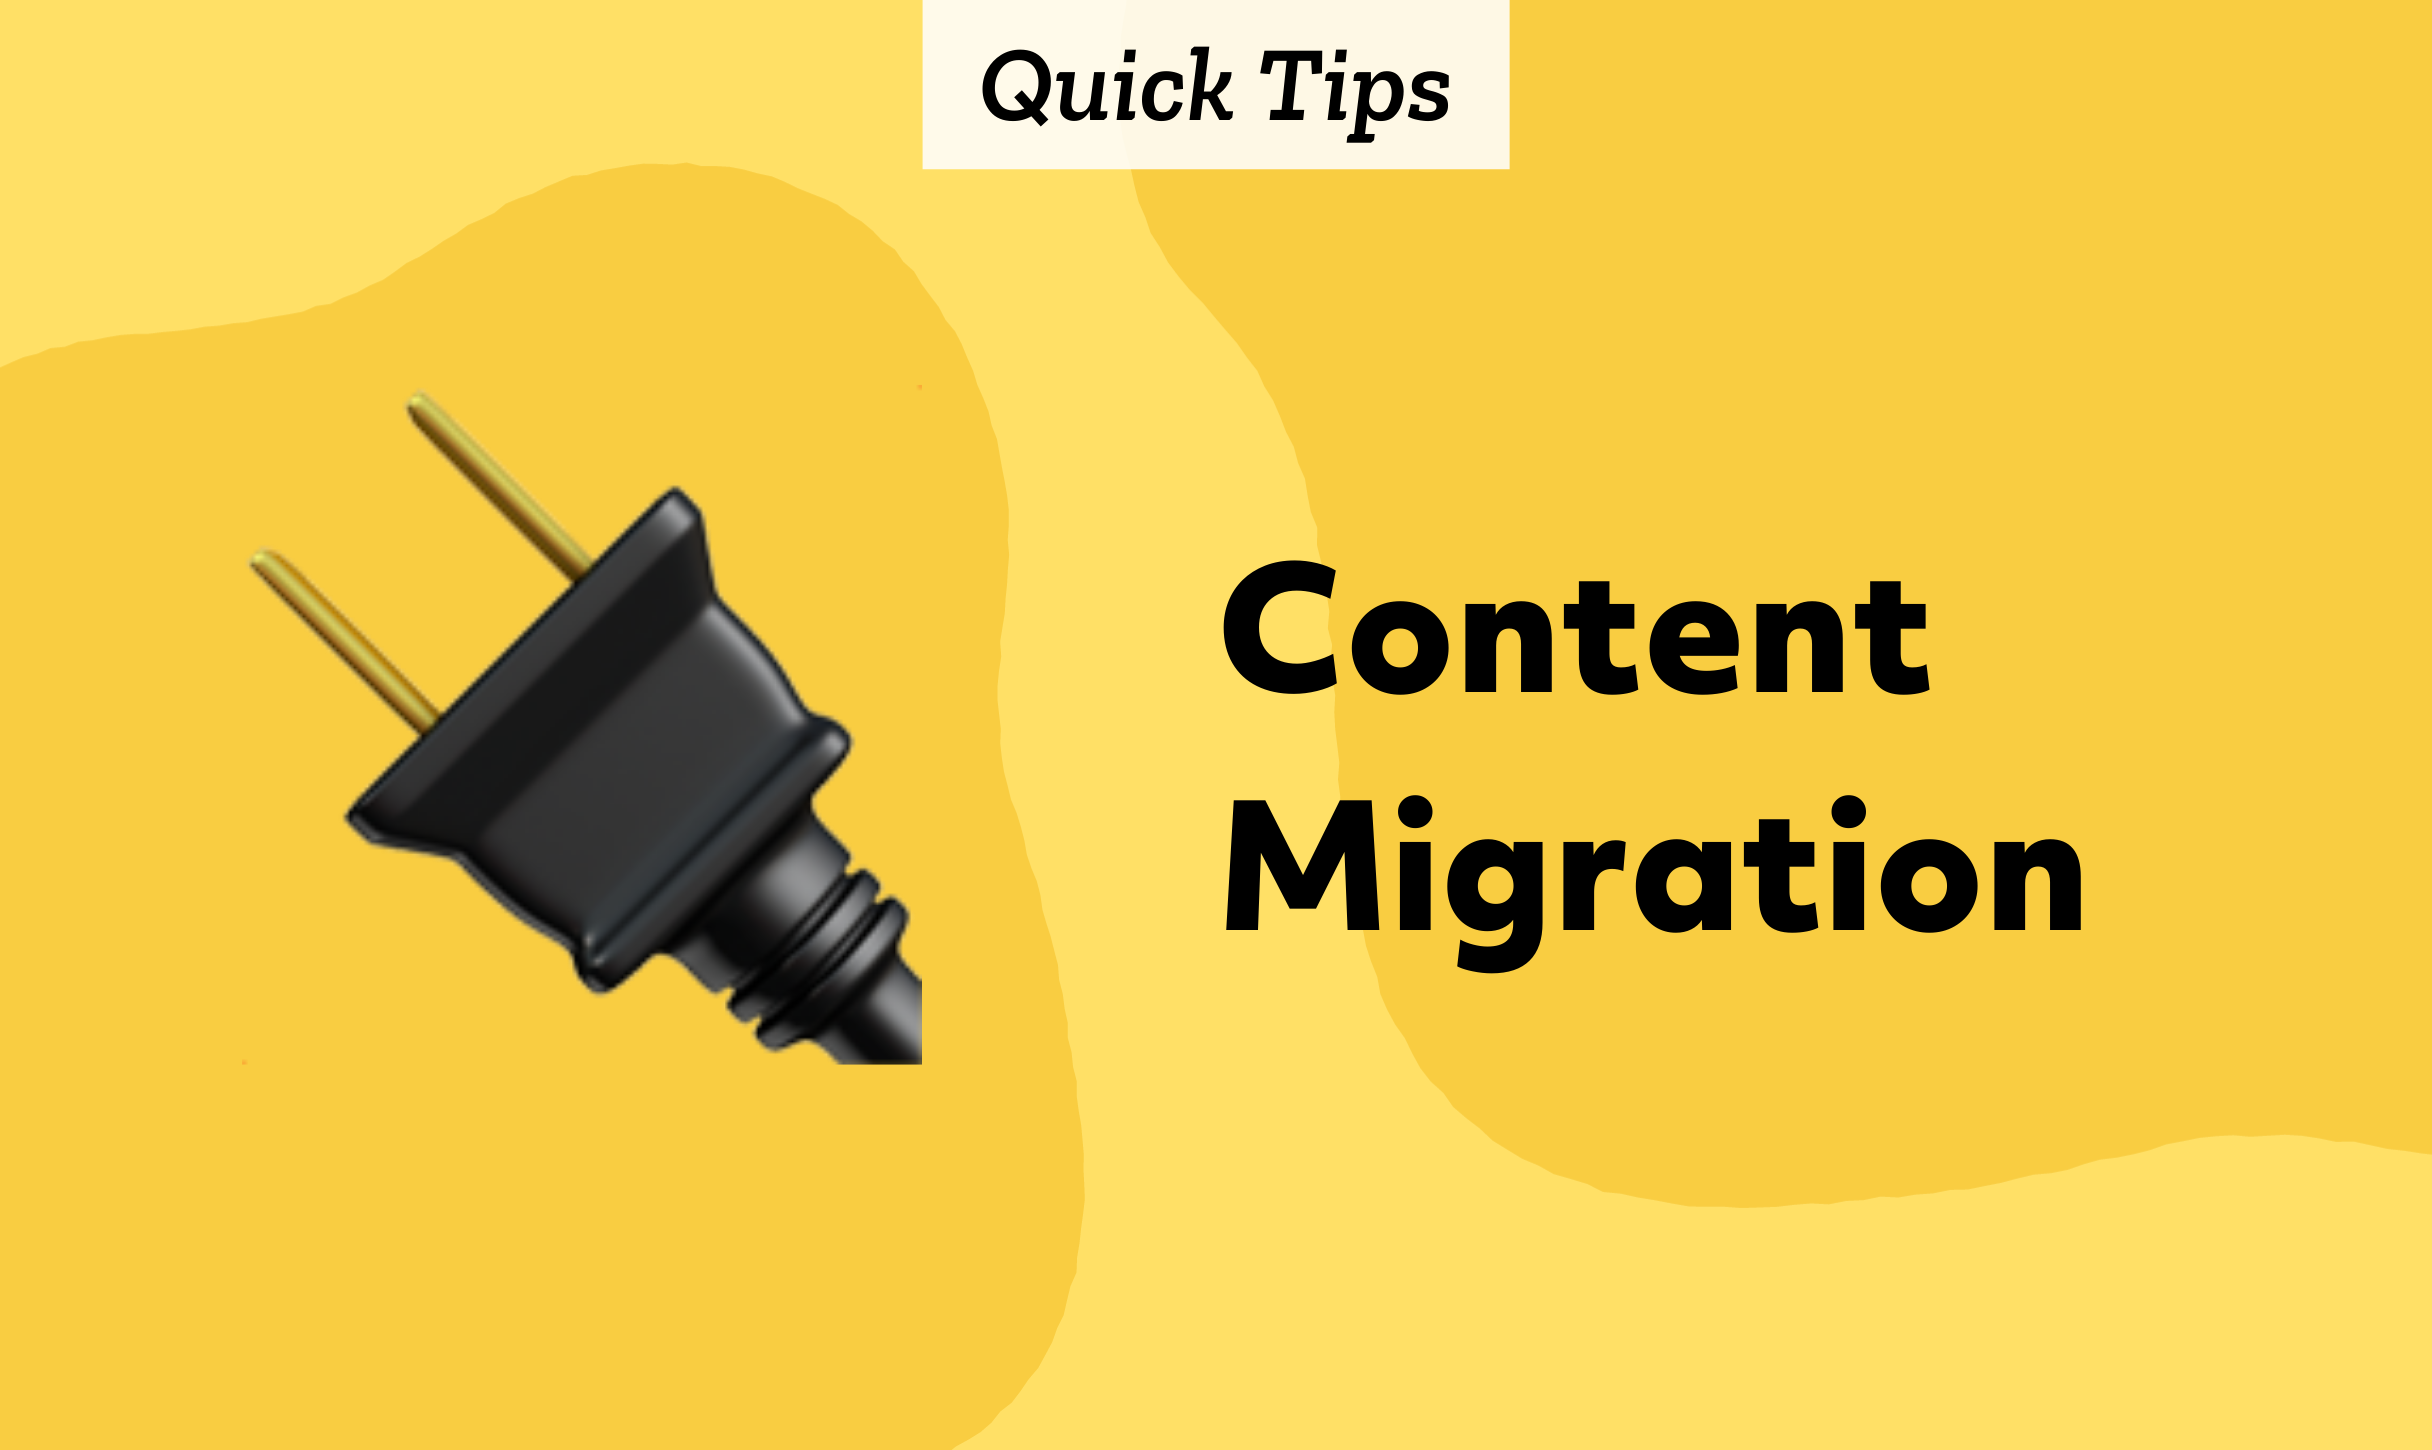 Quick Tips: Content Migration